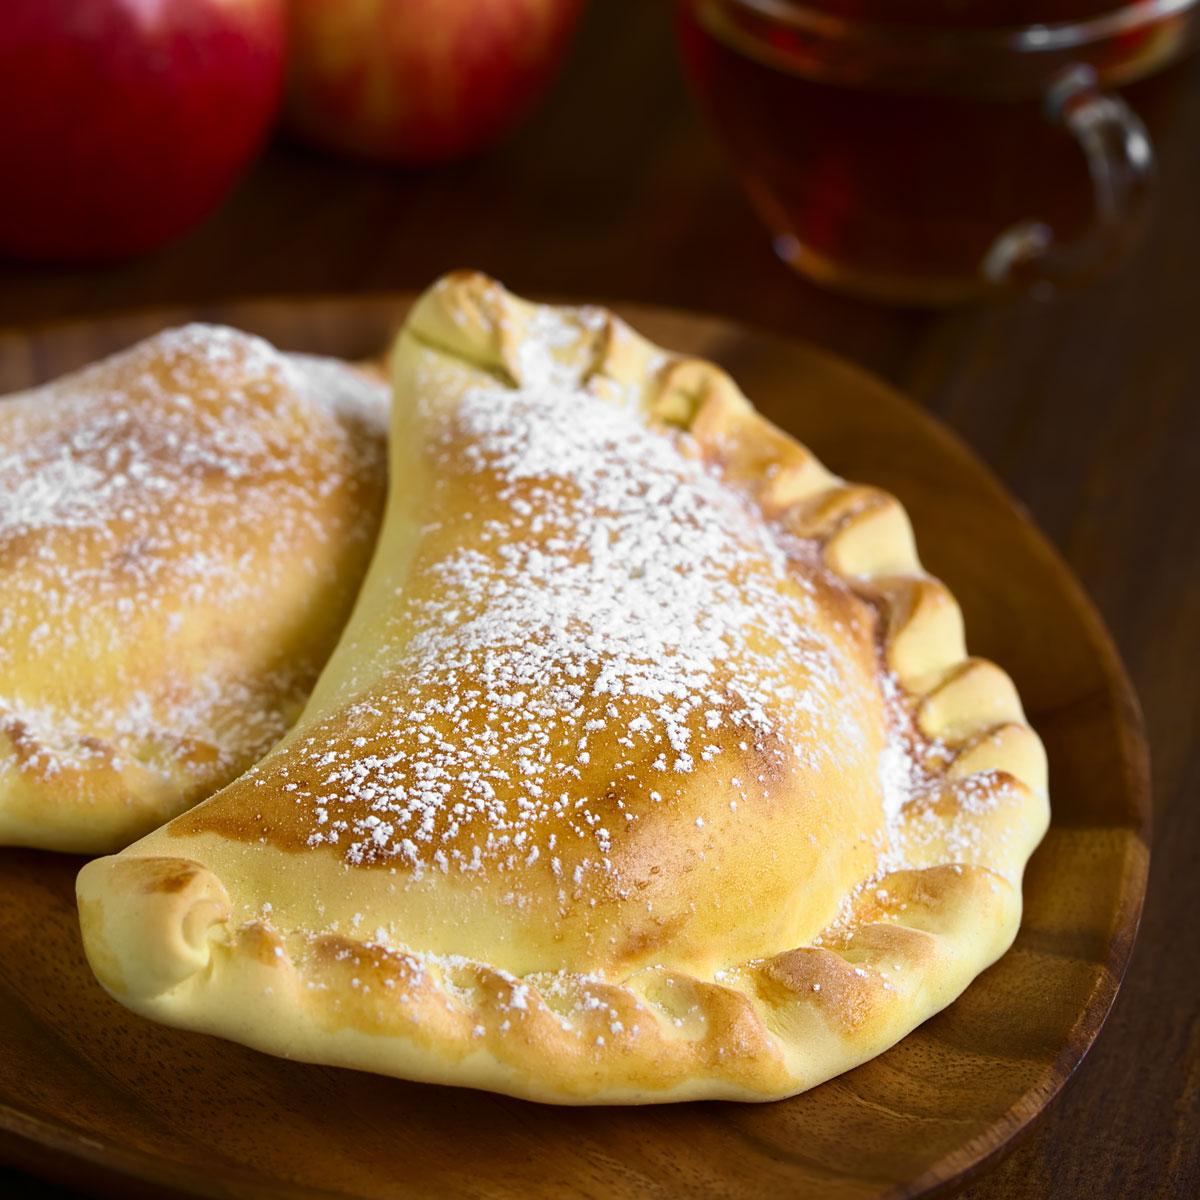 Cuban Apple Pastry Dessert